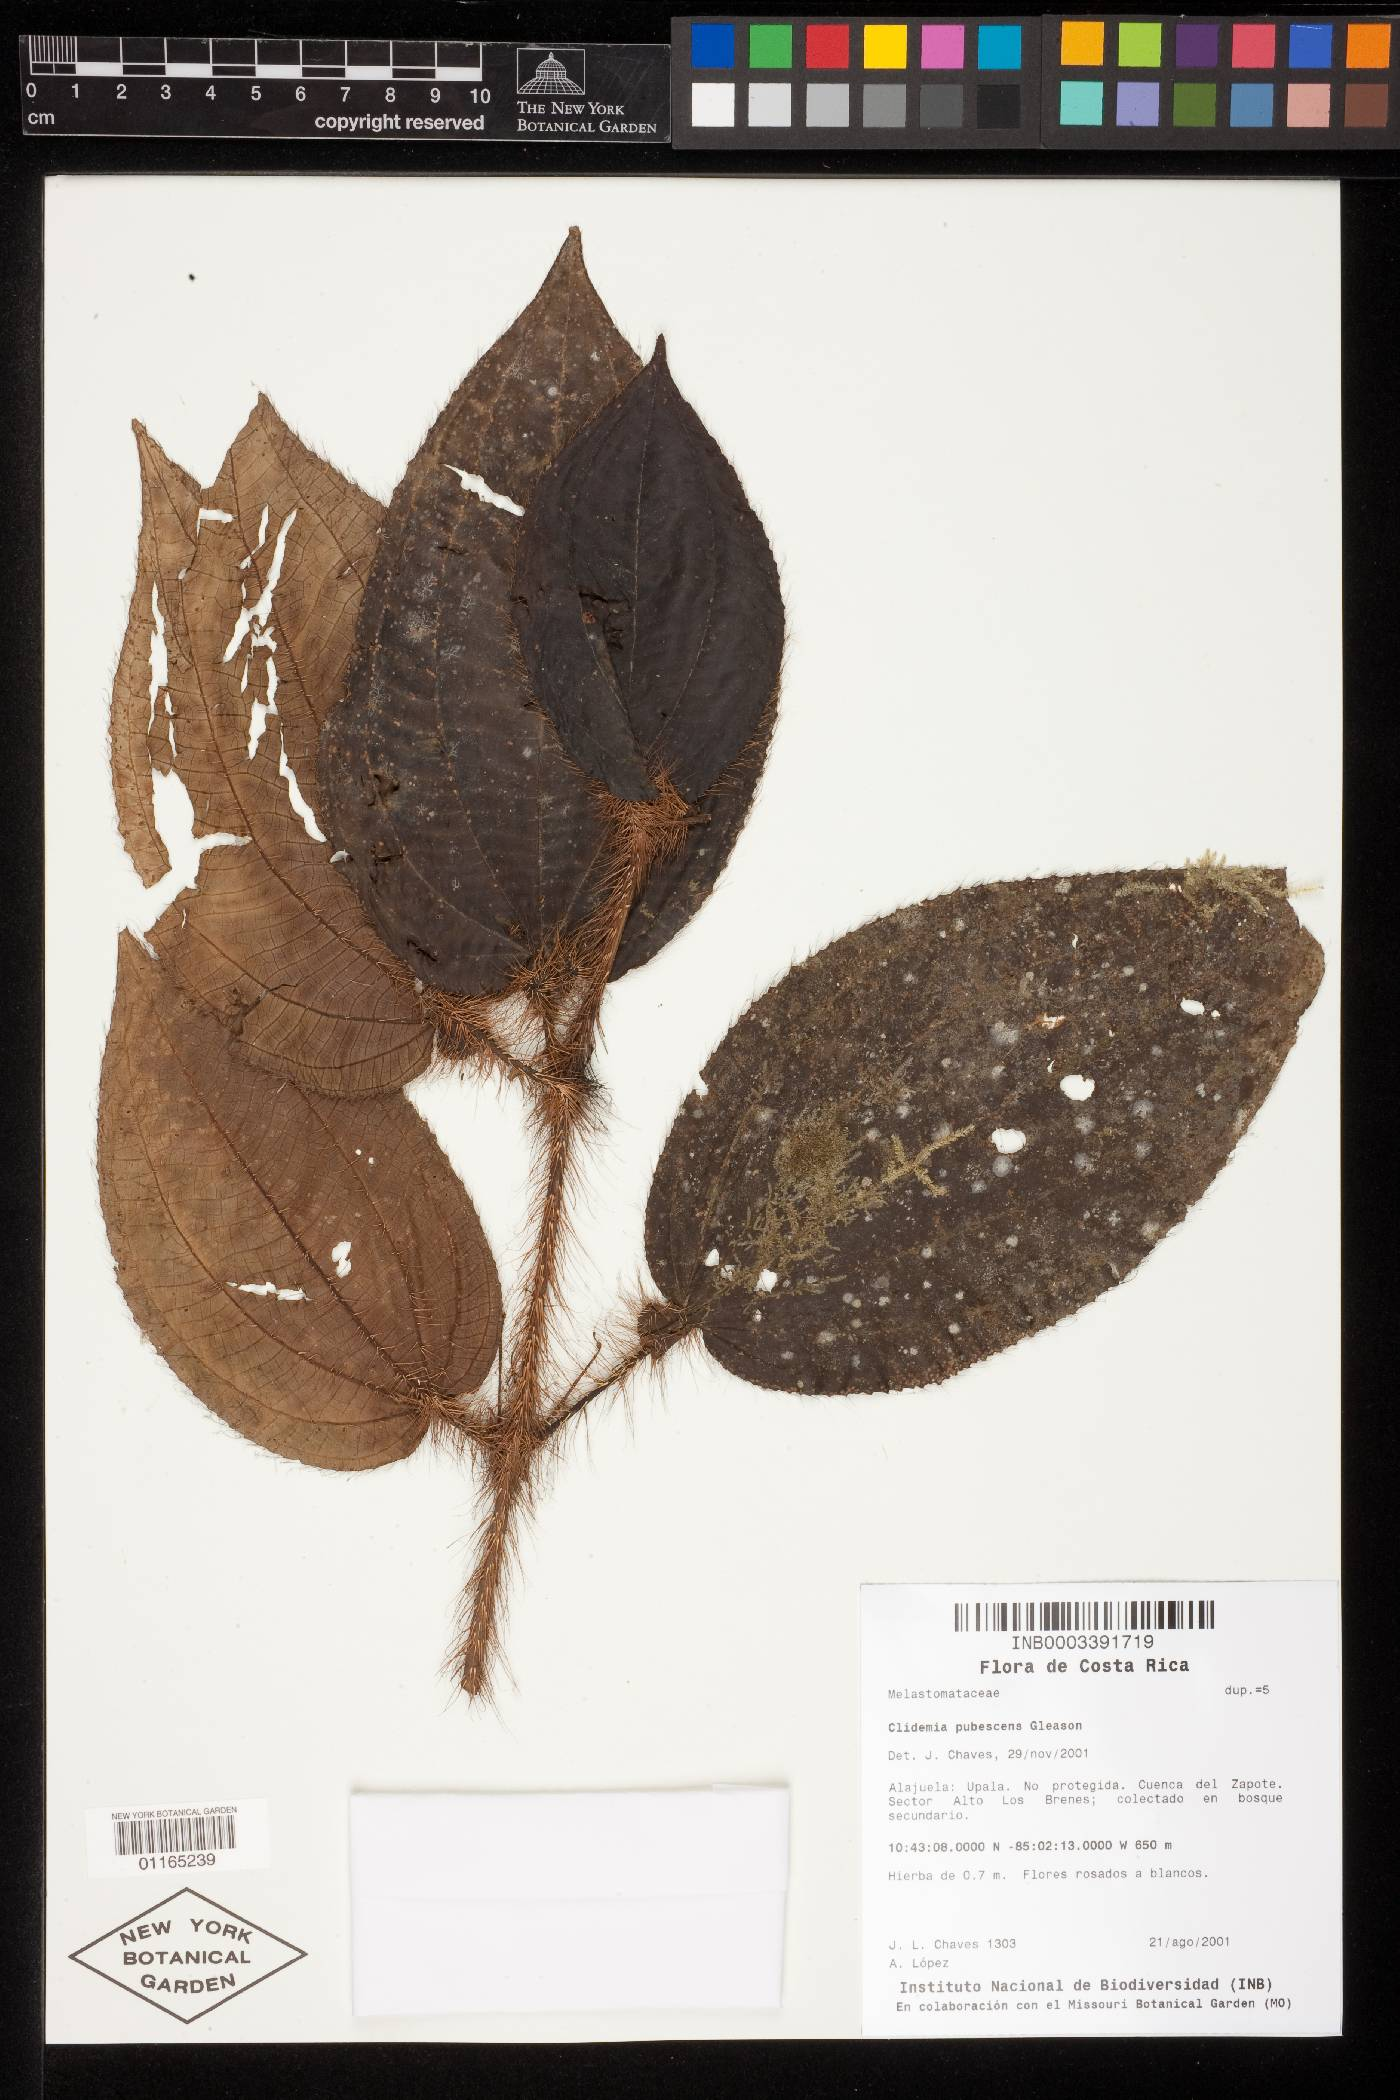 Clidemia pubescens image